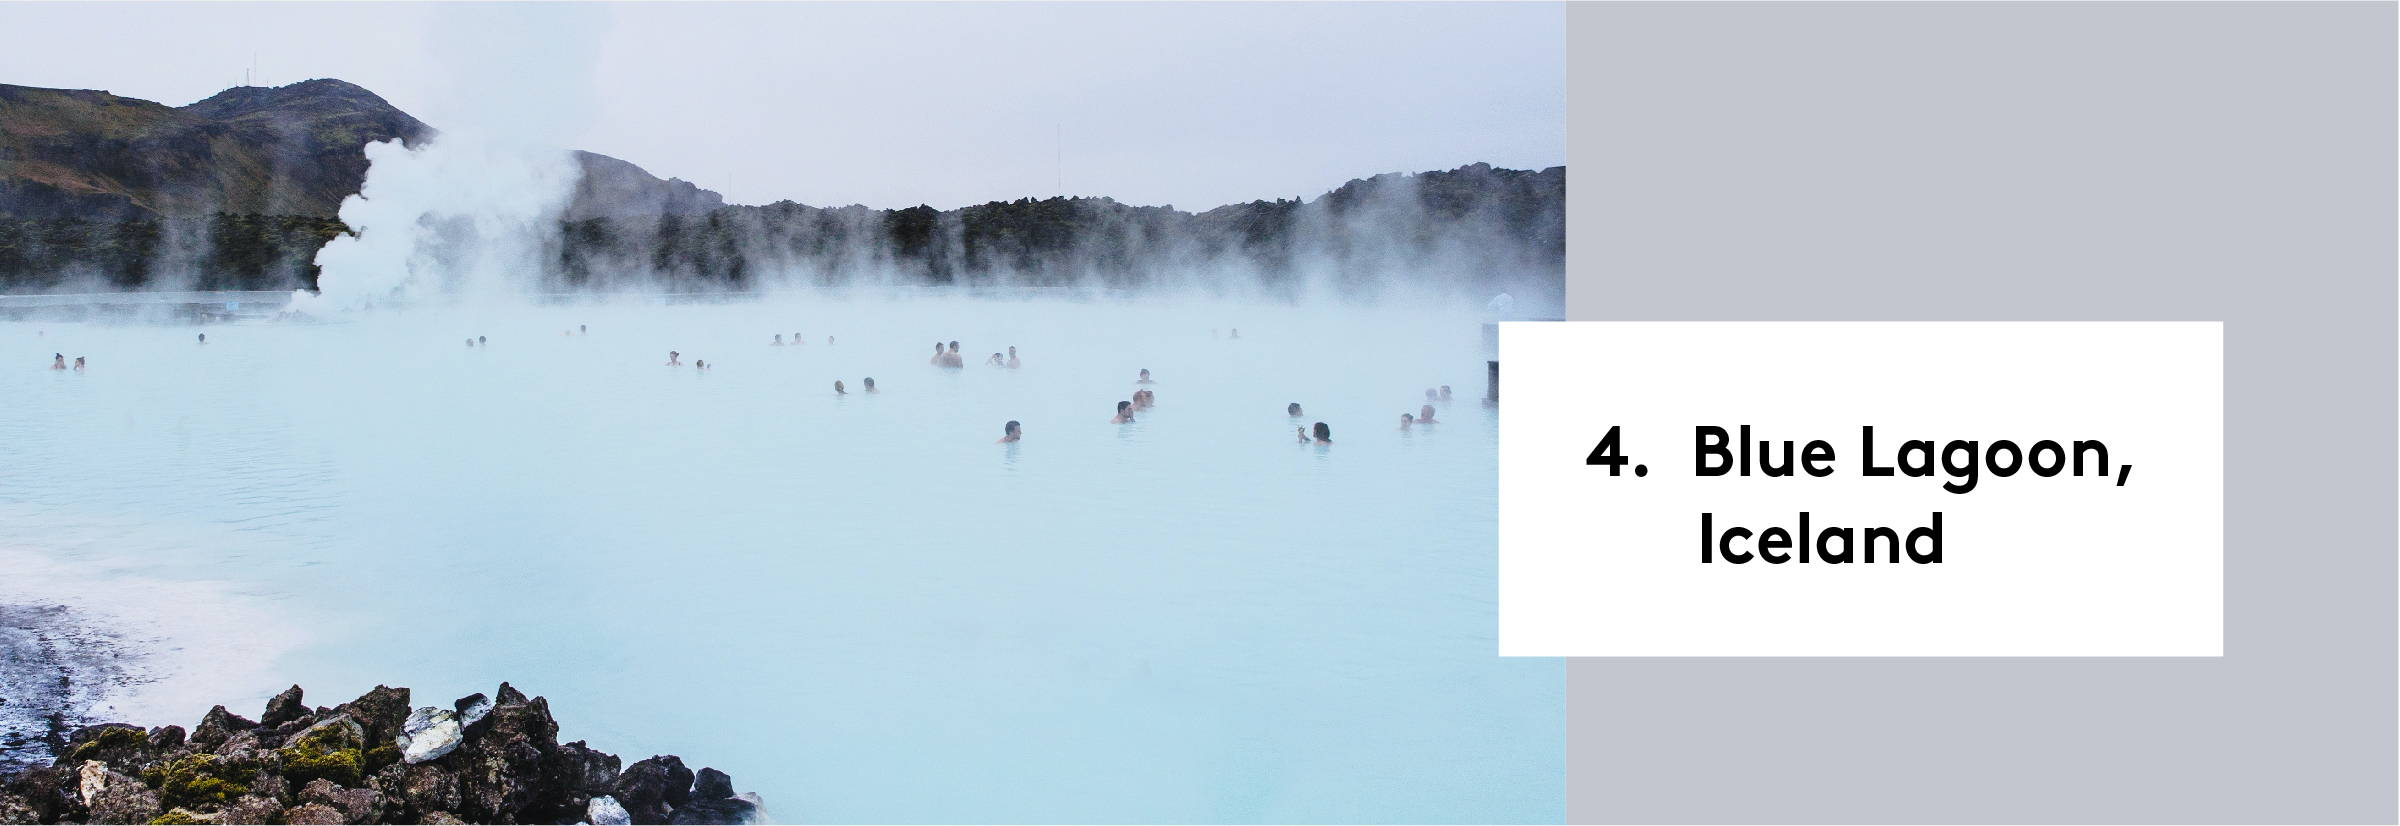 4. Blue Lagoon, Iceland